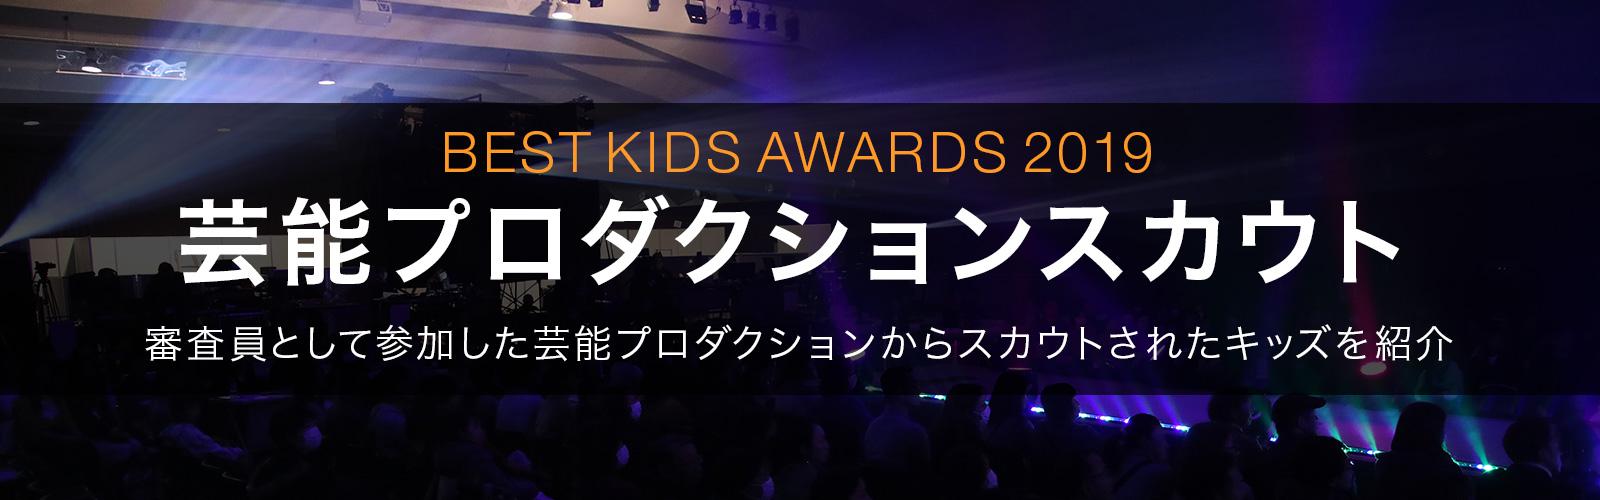 BEST KIDS AWARDS 2019 芸能プロダクションスカウト